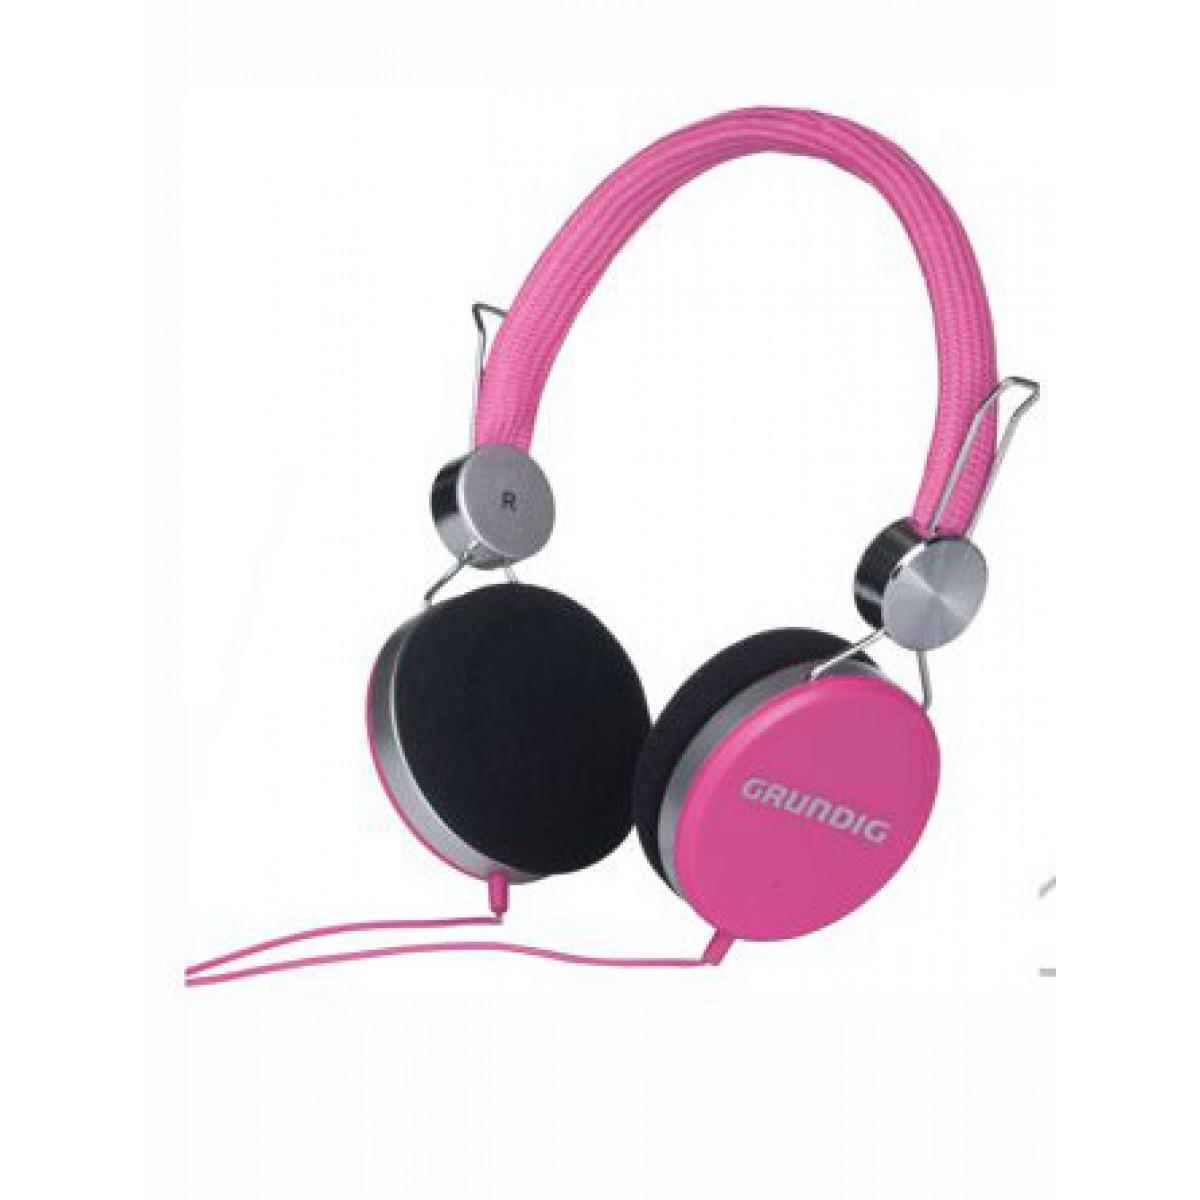 GRUNDIG Hovedtelefon pink